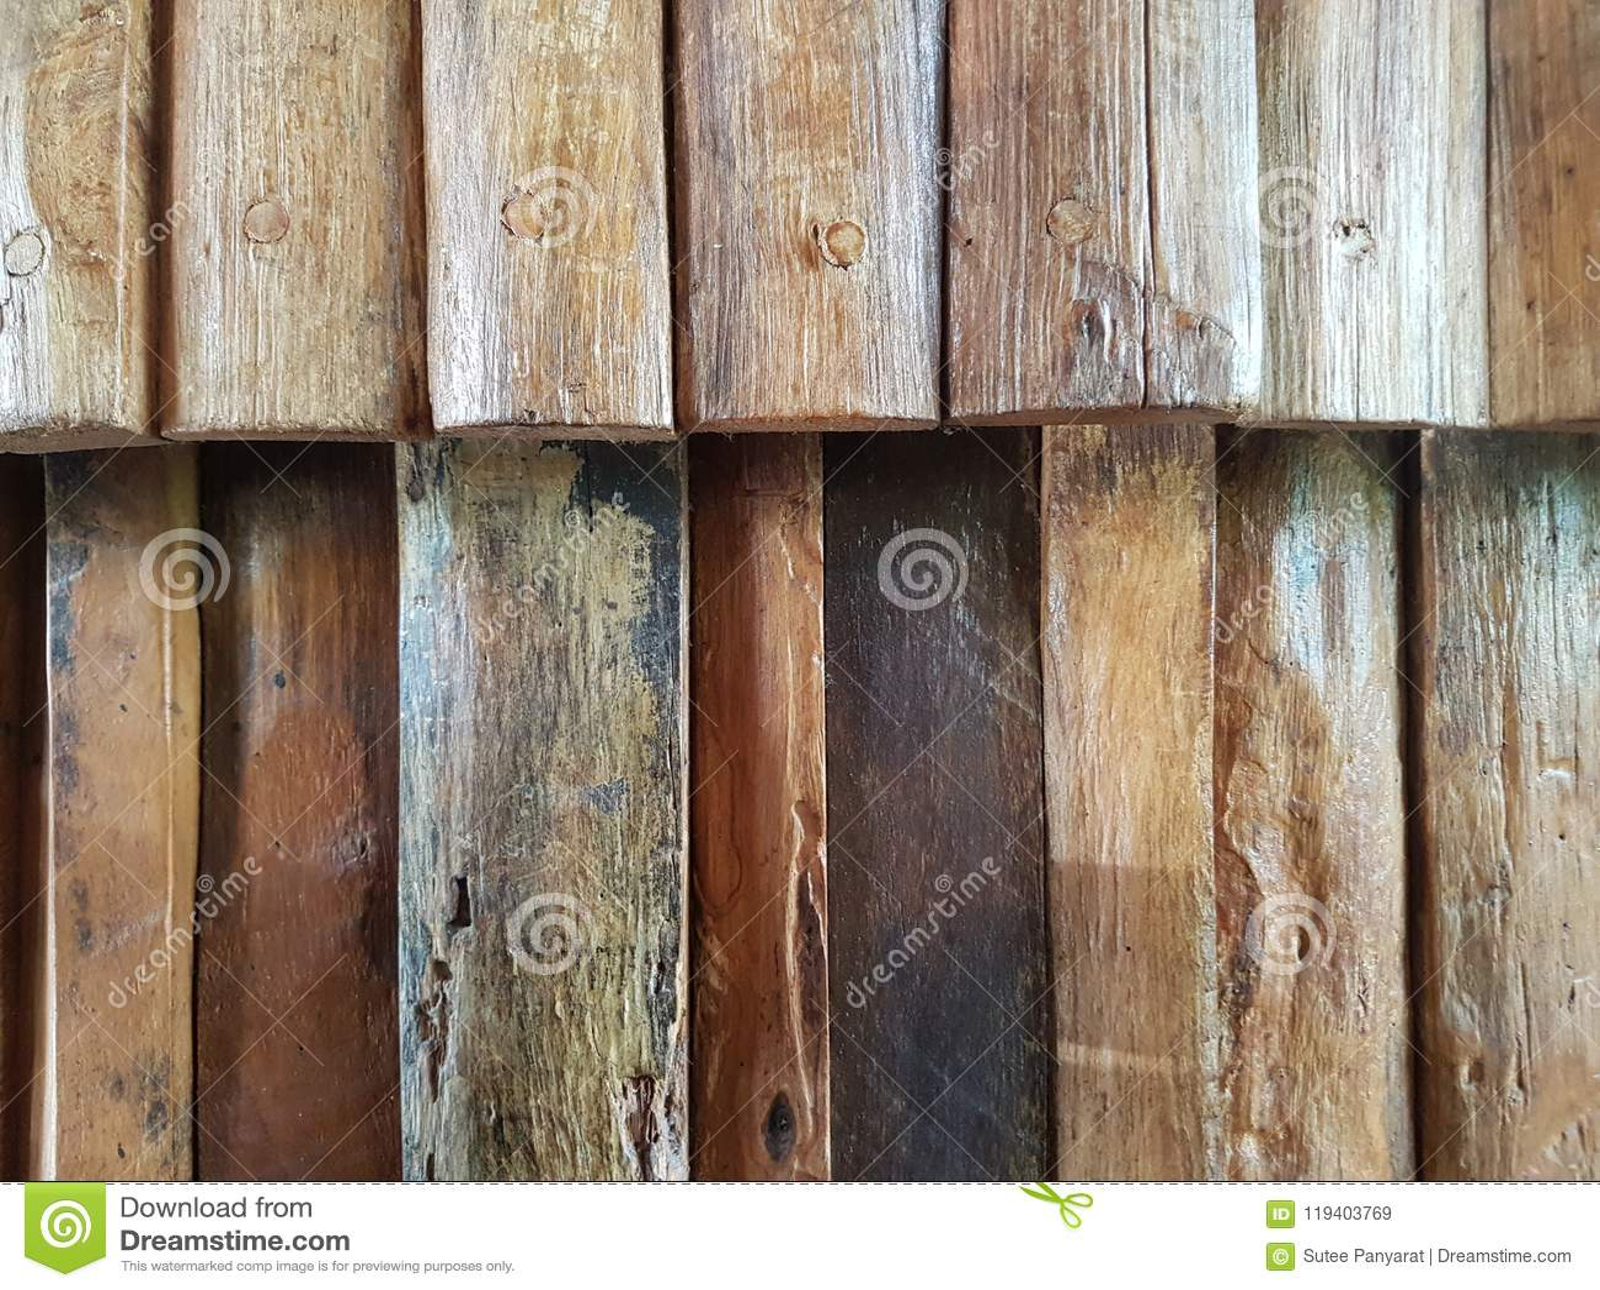 Golden Teak Wood Stock Image Image Of Grunge Ratro 119403769